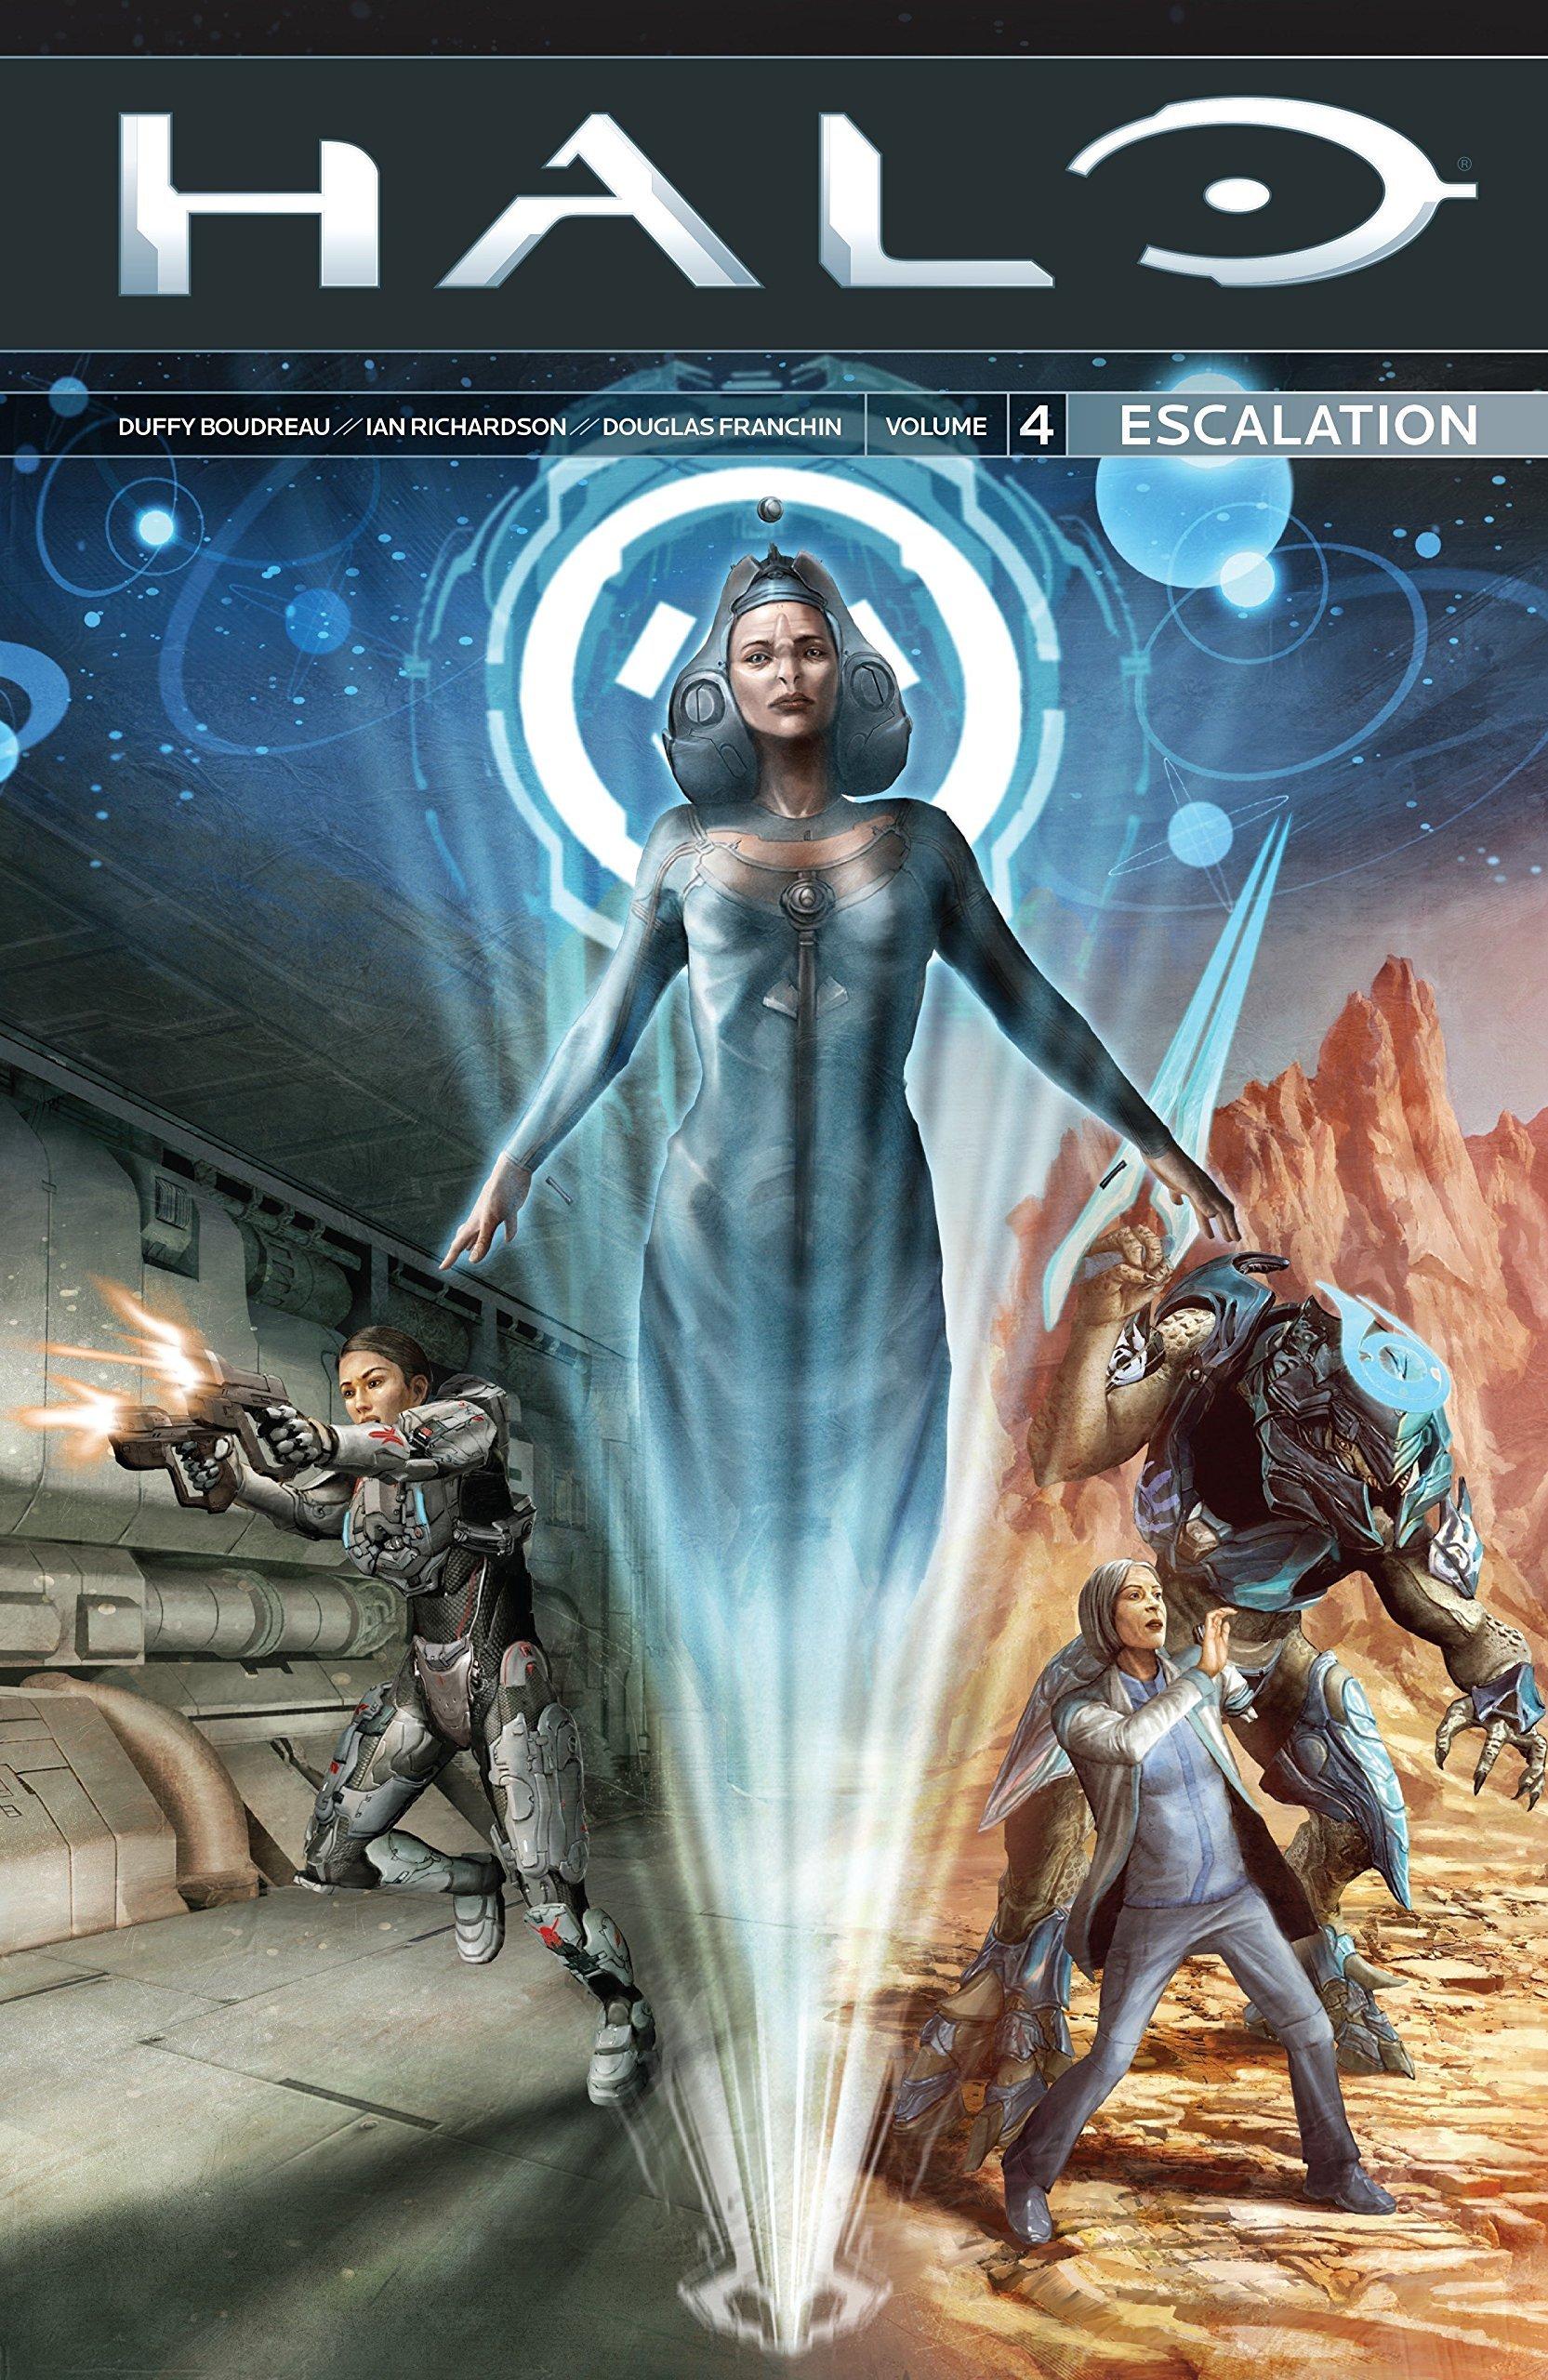 Halo - Escalation Volume 4 TPB